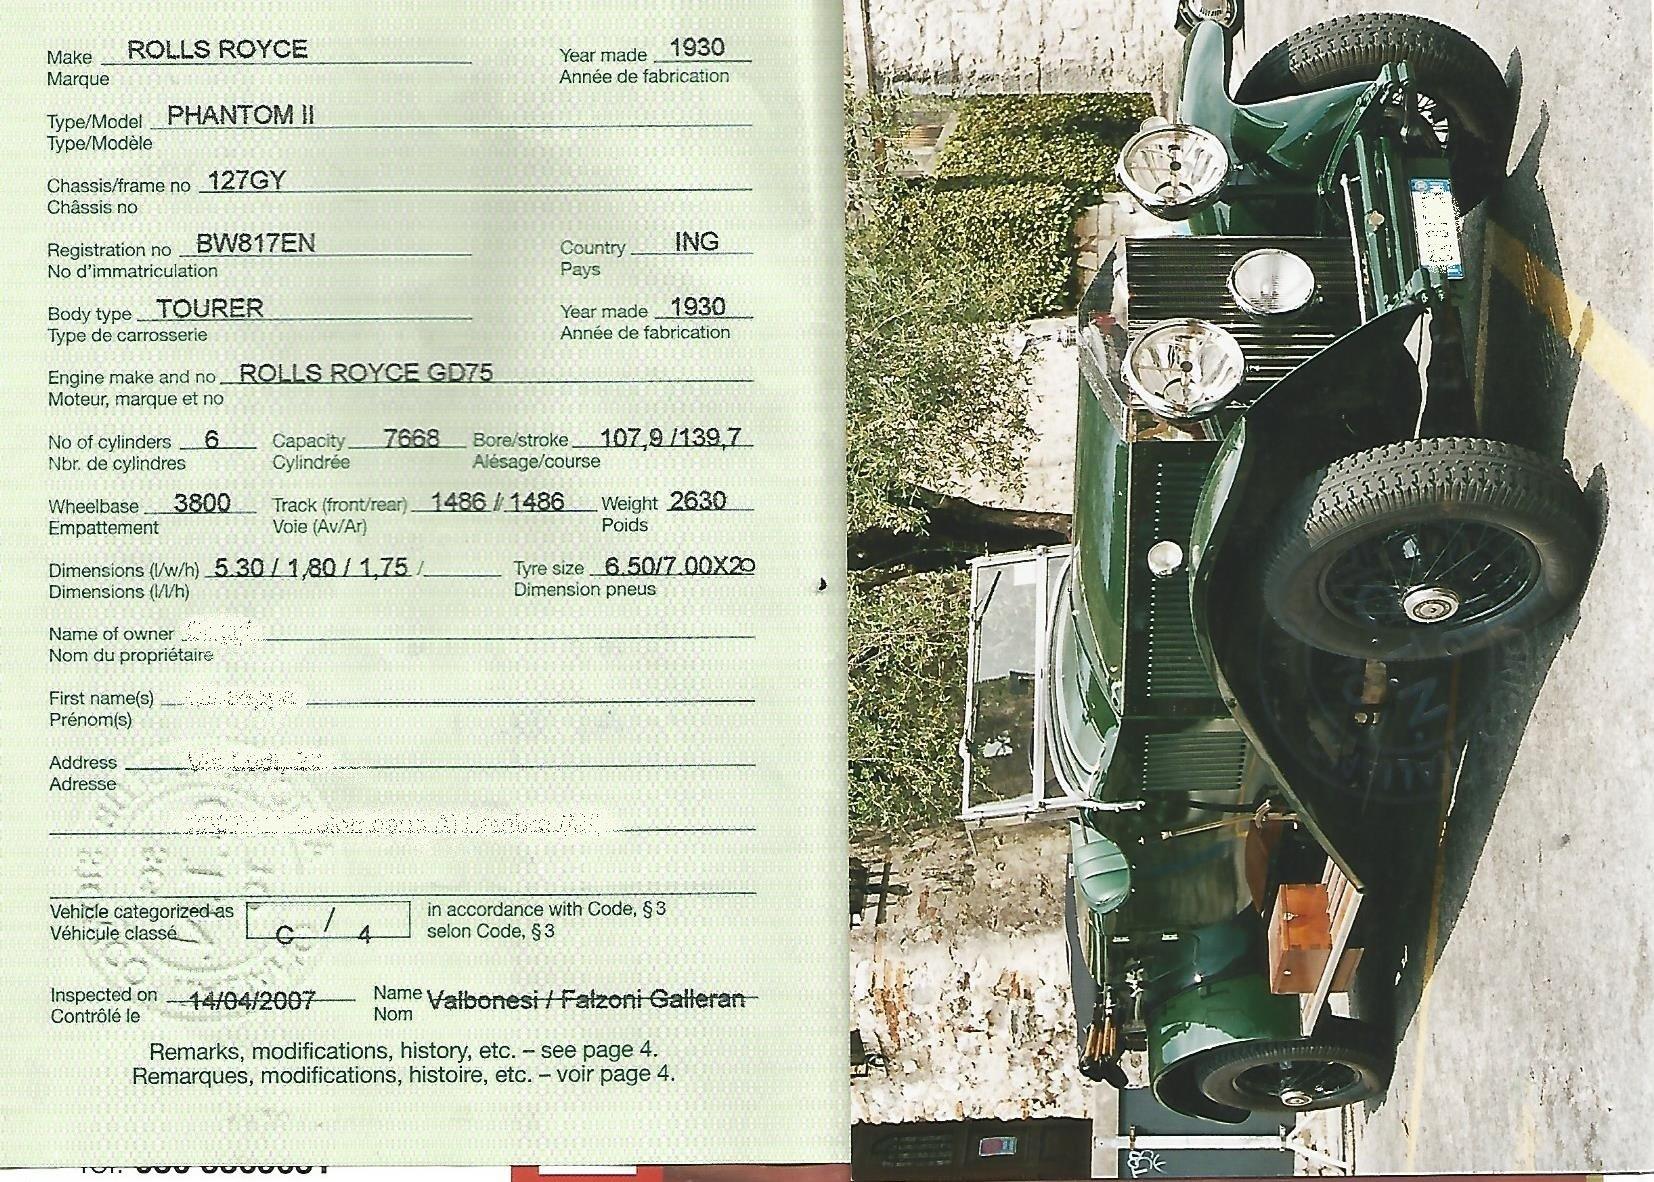 1930 ROLLS ROYCE PHANTOM II SPORT TOURER For Sale (picture 6 of 6)